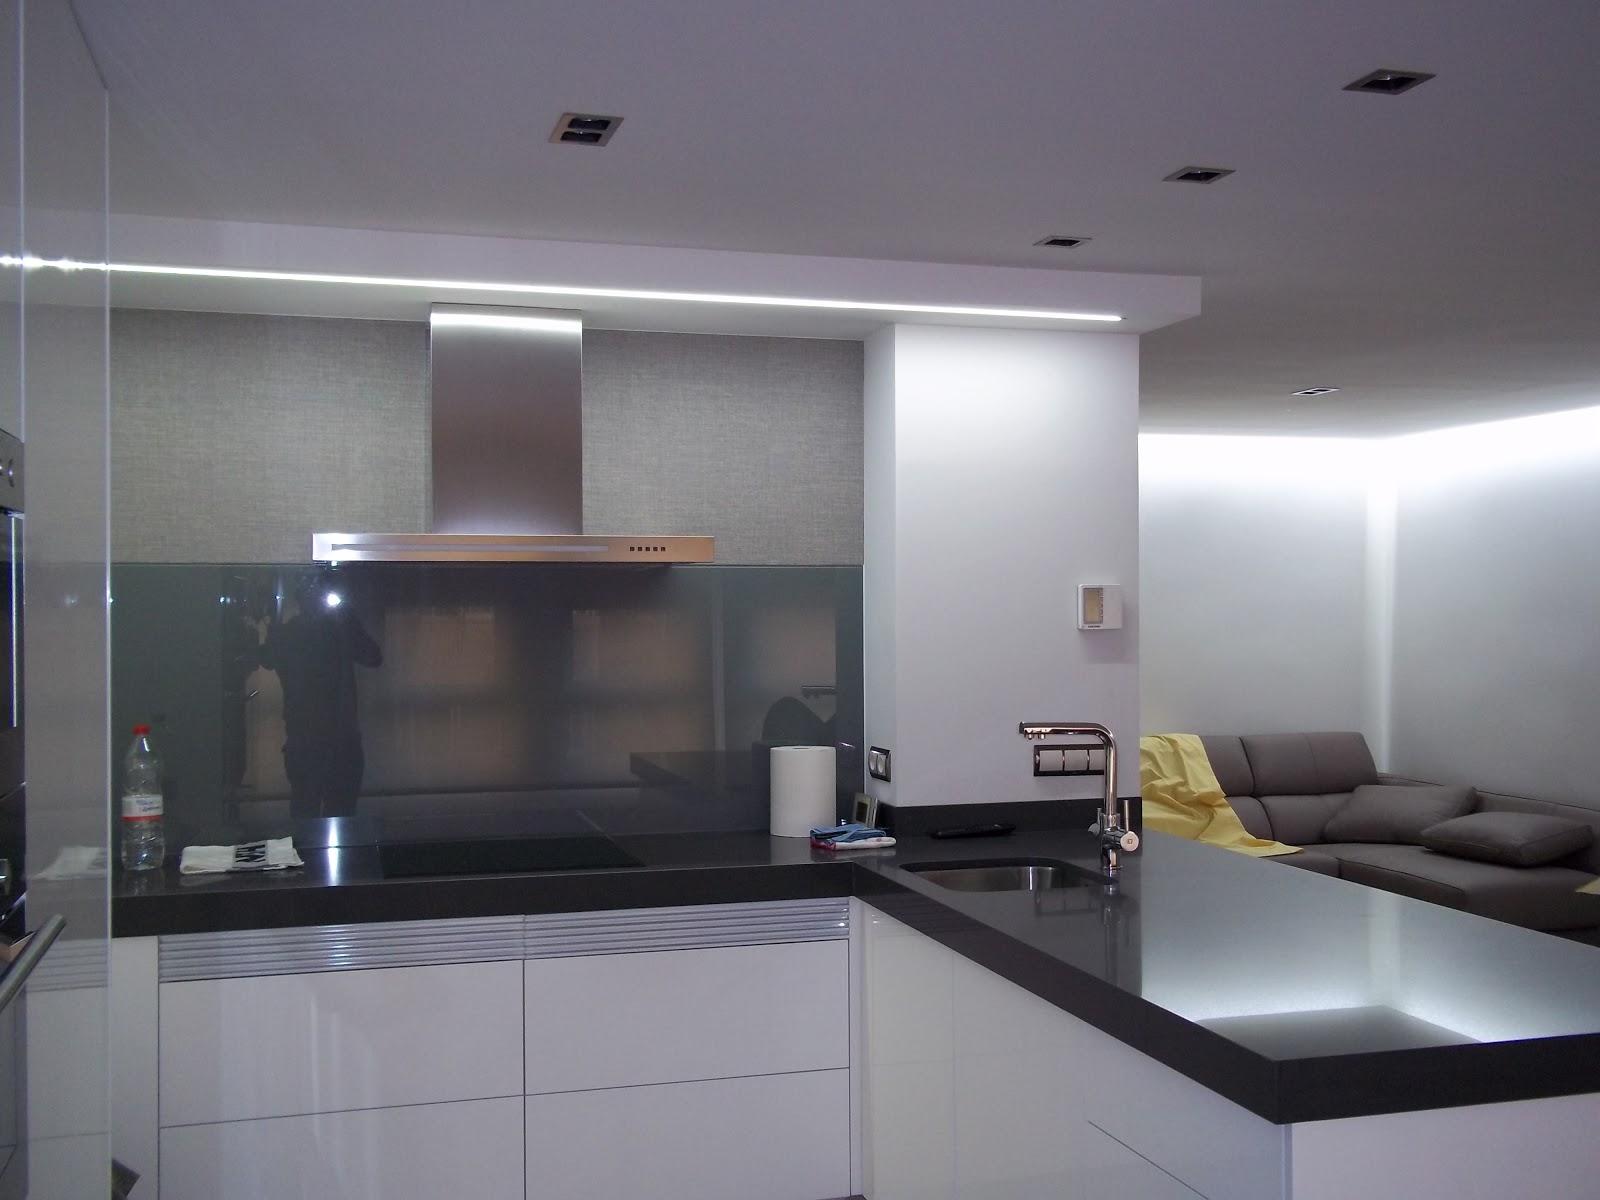 Iluminacion indirecta led disponible en color aplique de - Iluminacion indirecta led ...